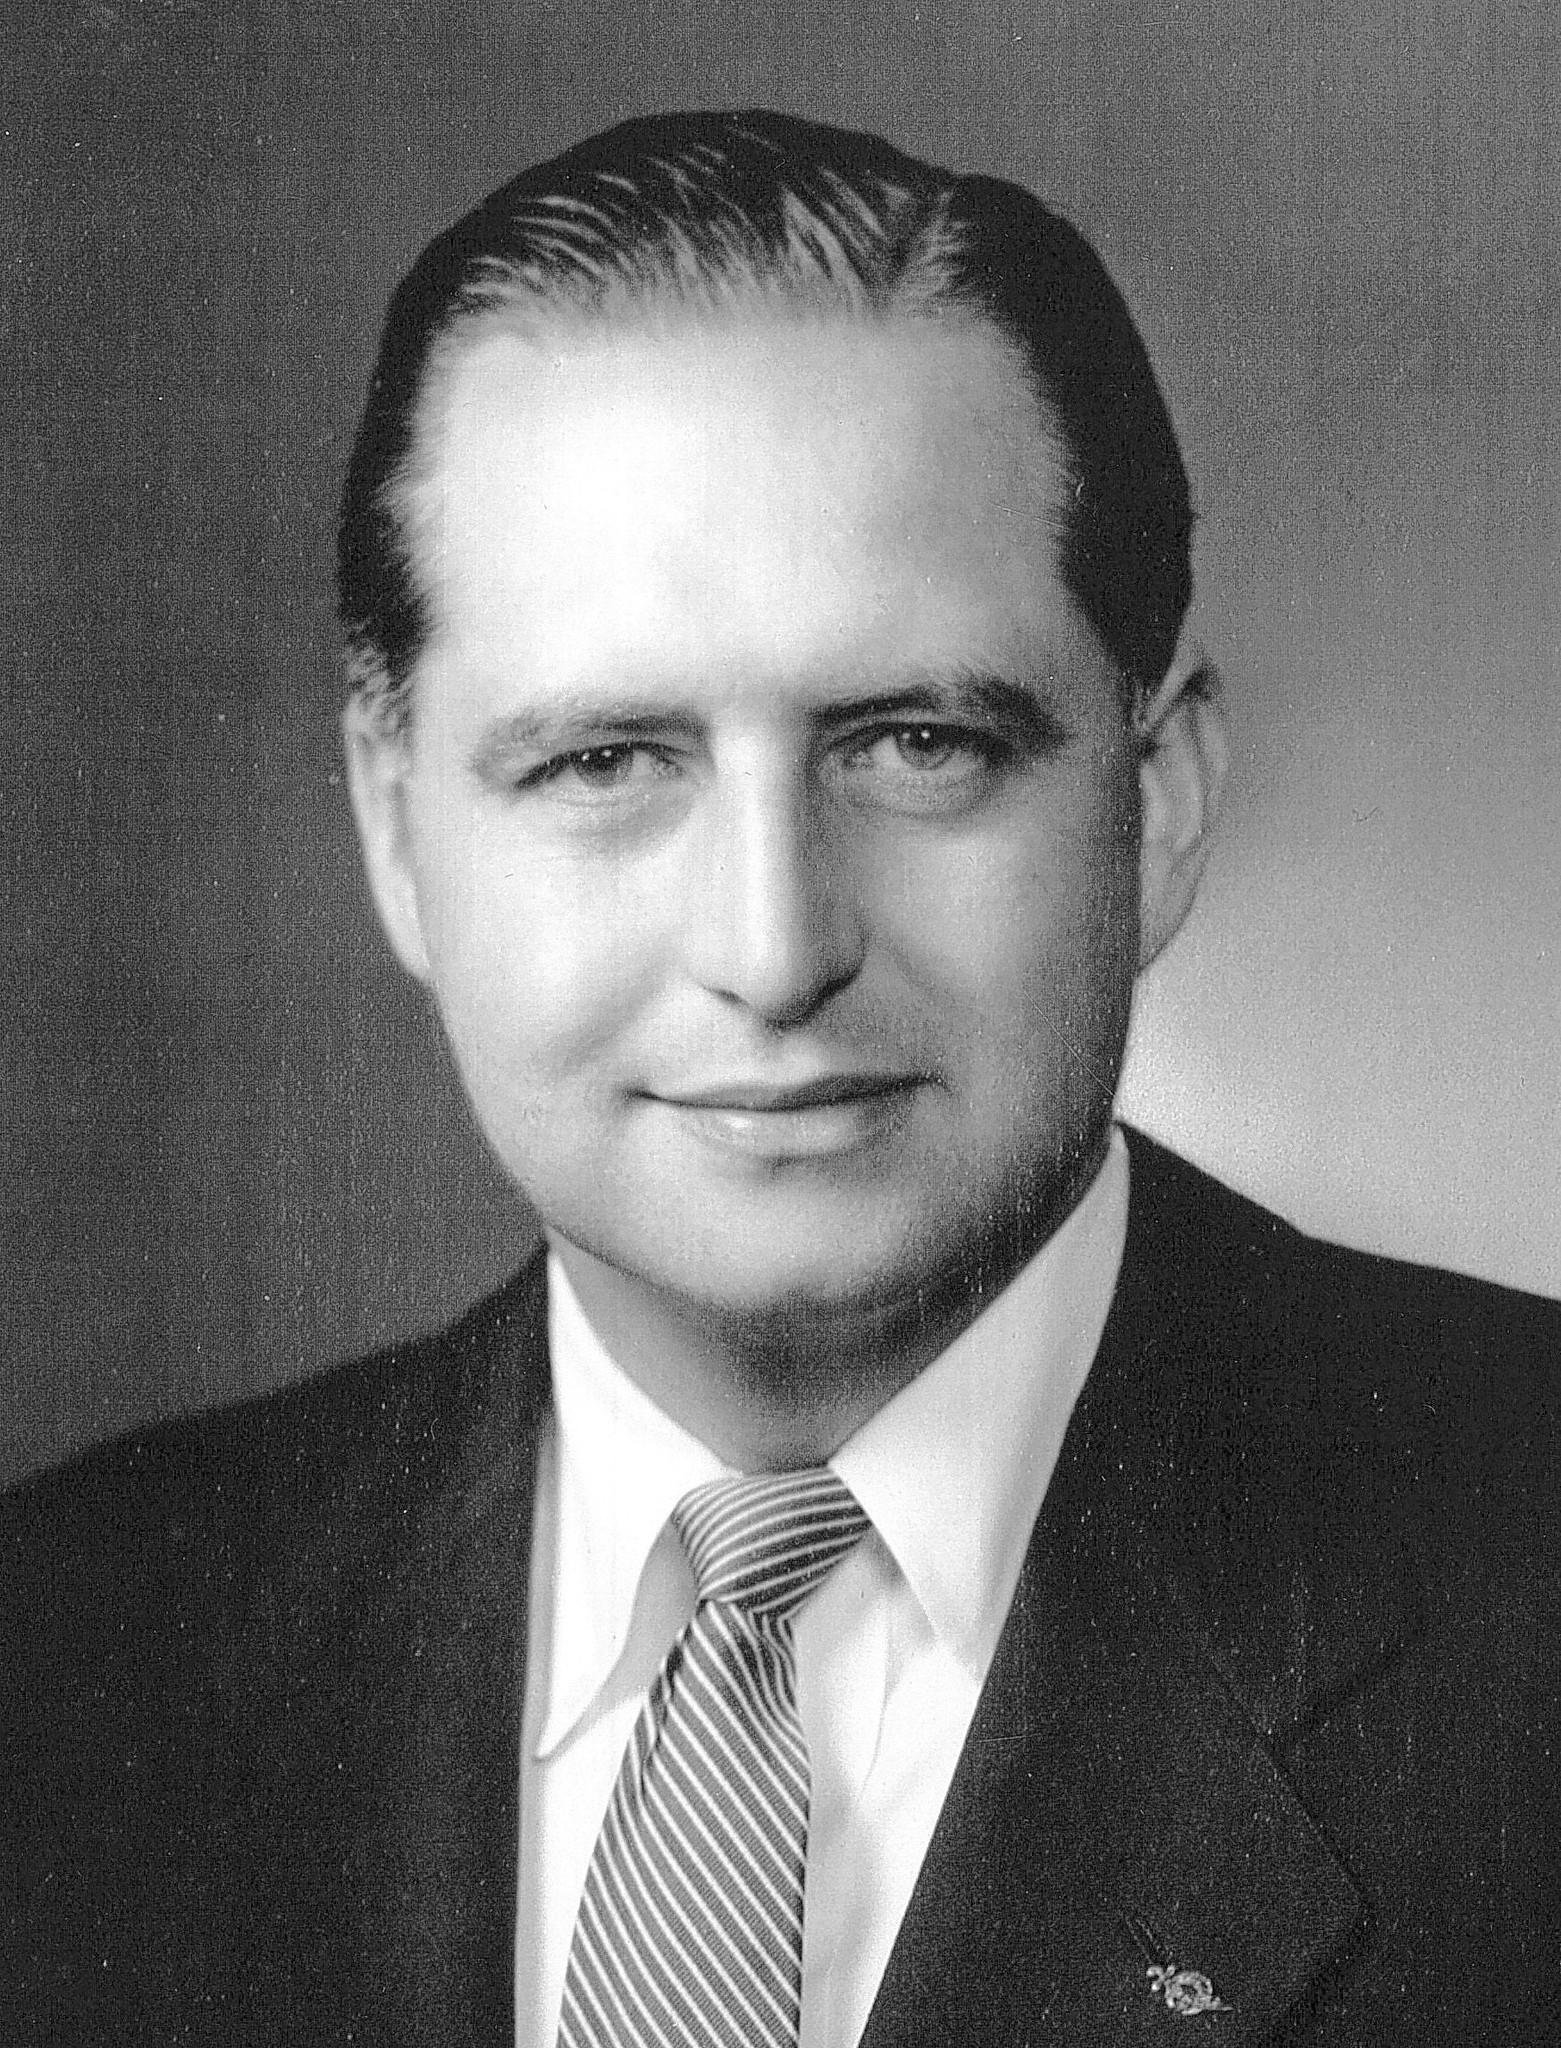 John H. Zink